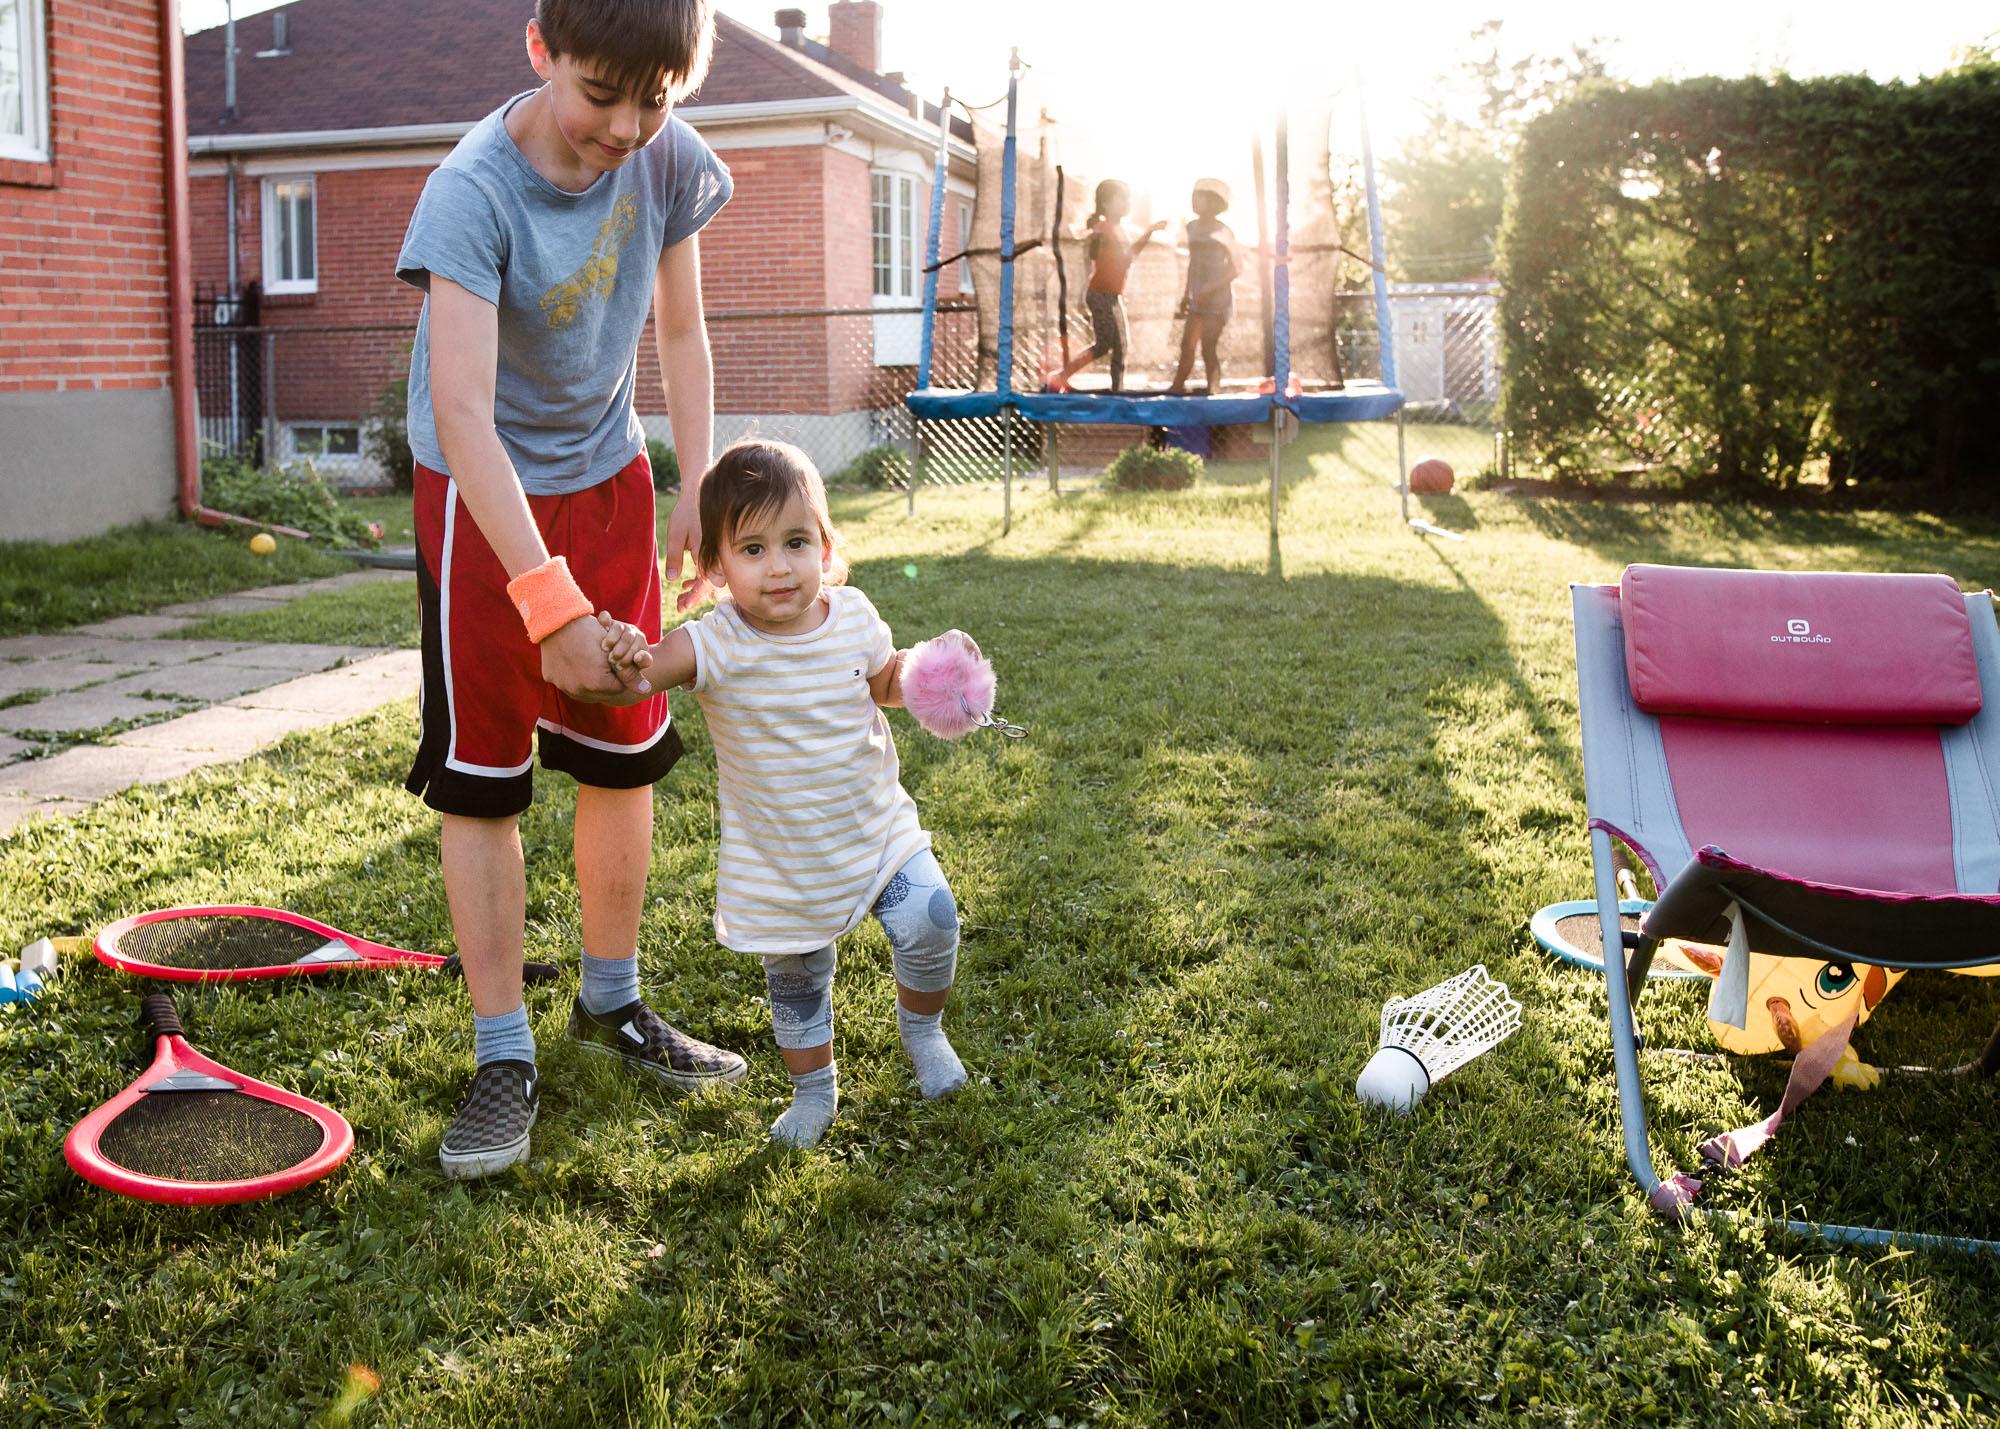 montreal-family-photography-backyard02-2.jpg